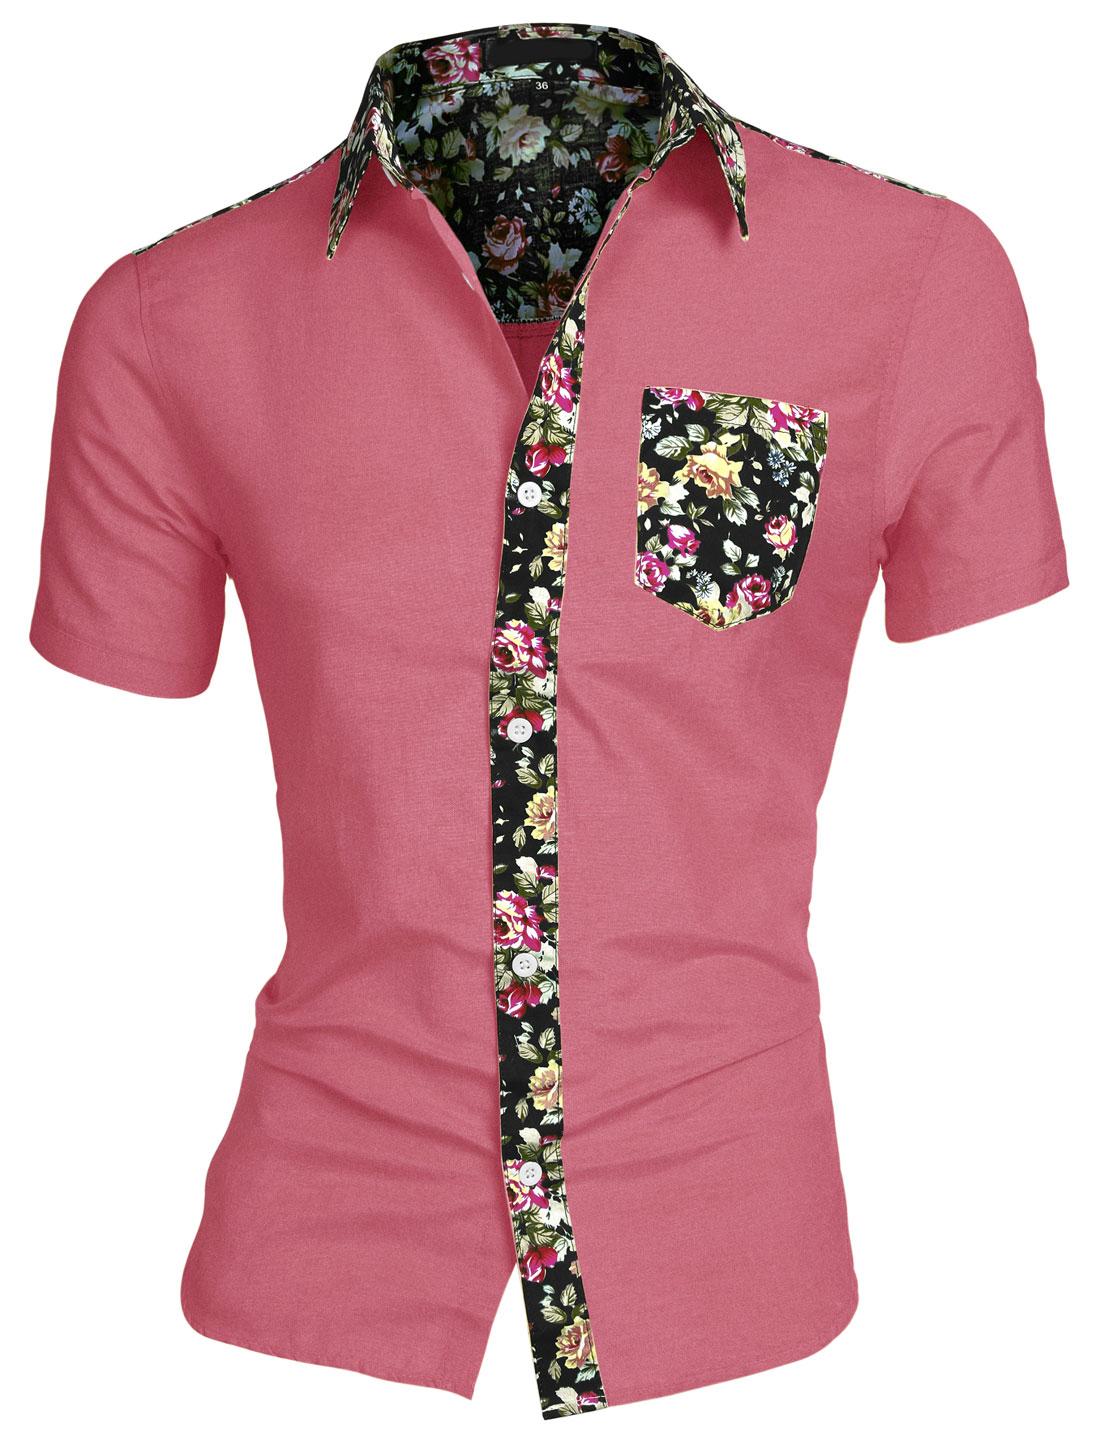 Men Short Sleeves Floral Prints Button-Front Shirt Fuchsia L